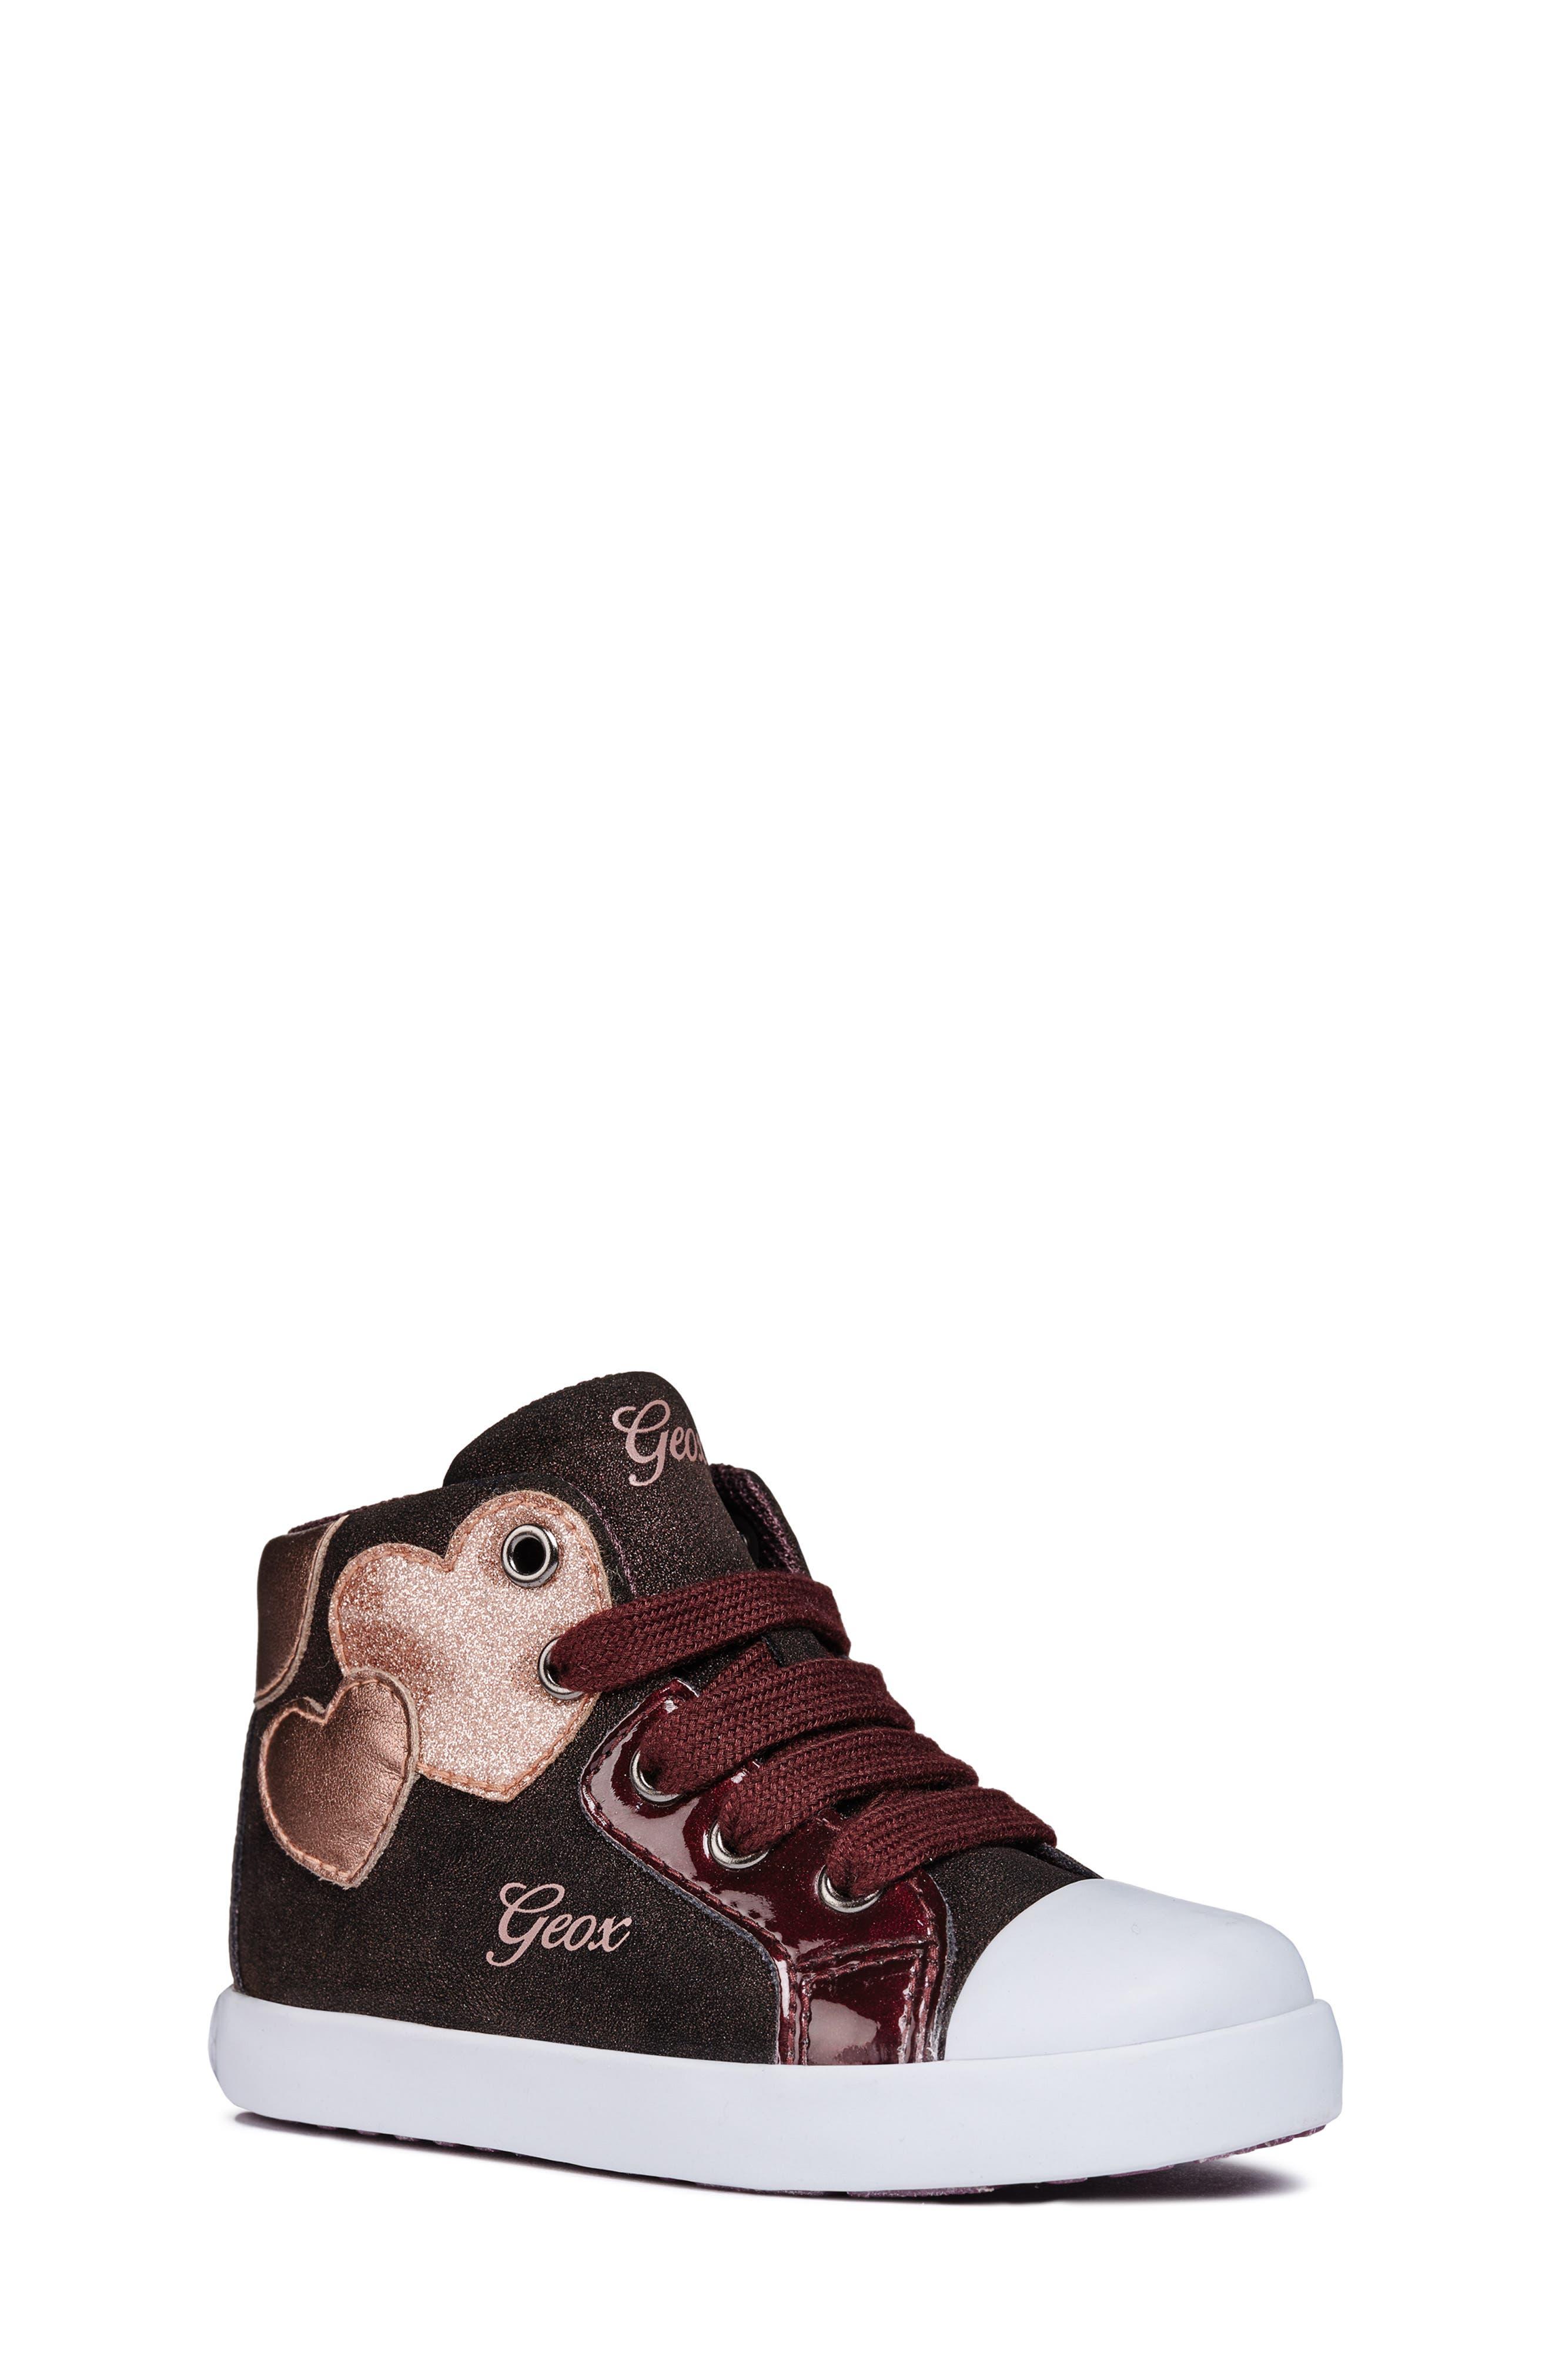 Kilwi Sparkle High Top Sneaker,                             Main thumbnail 1, color,                             DARK BURGUNDY